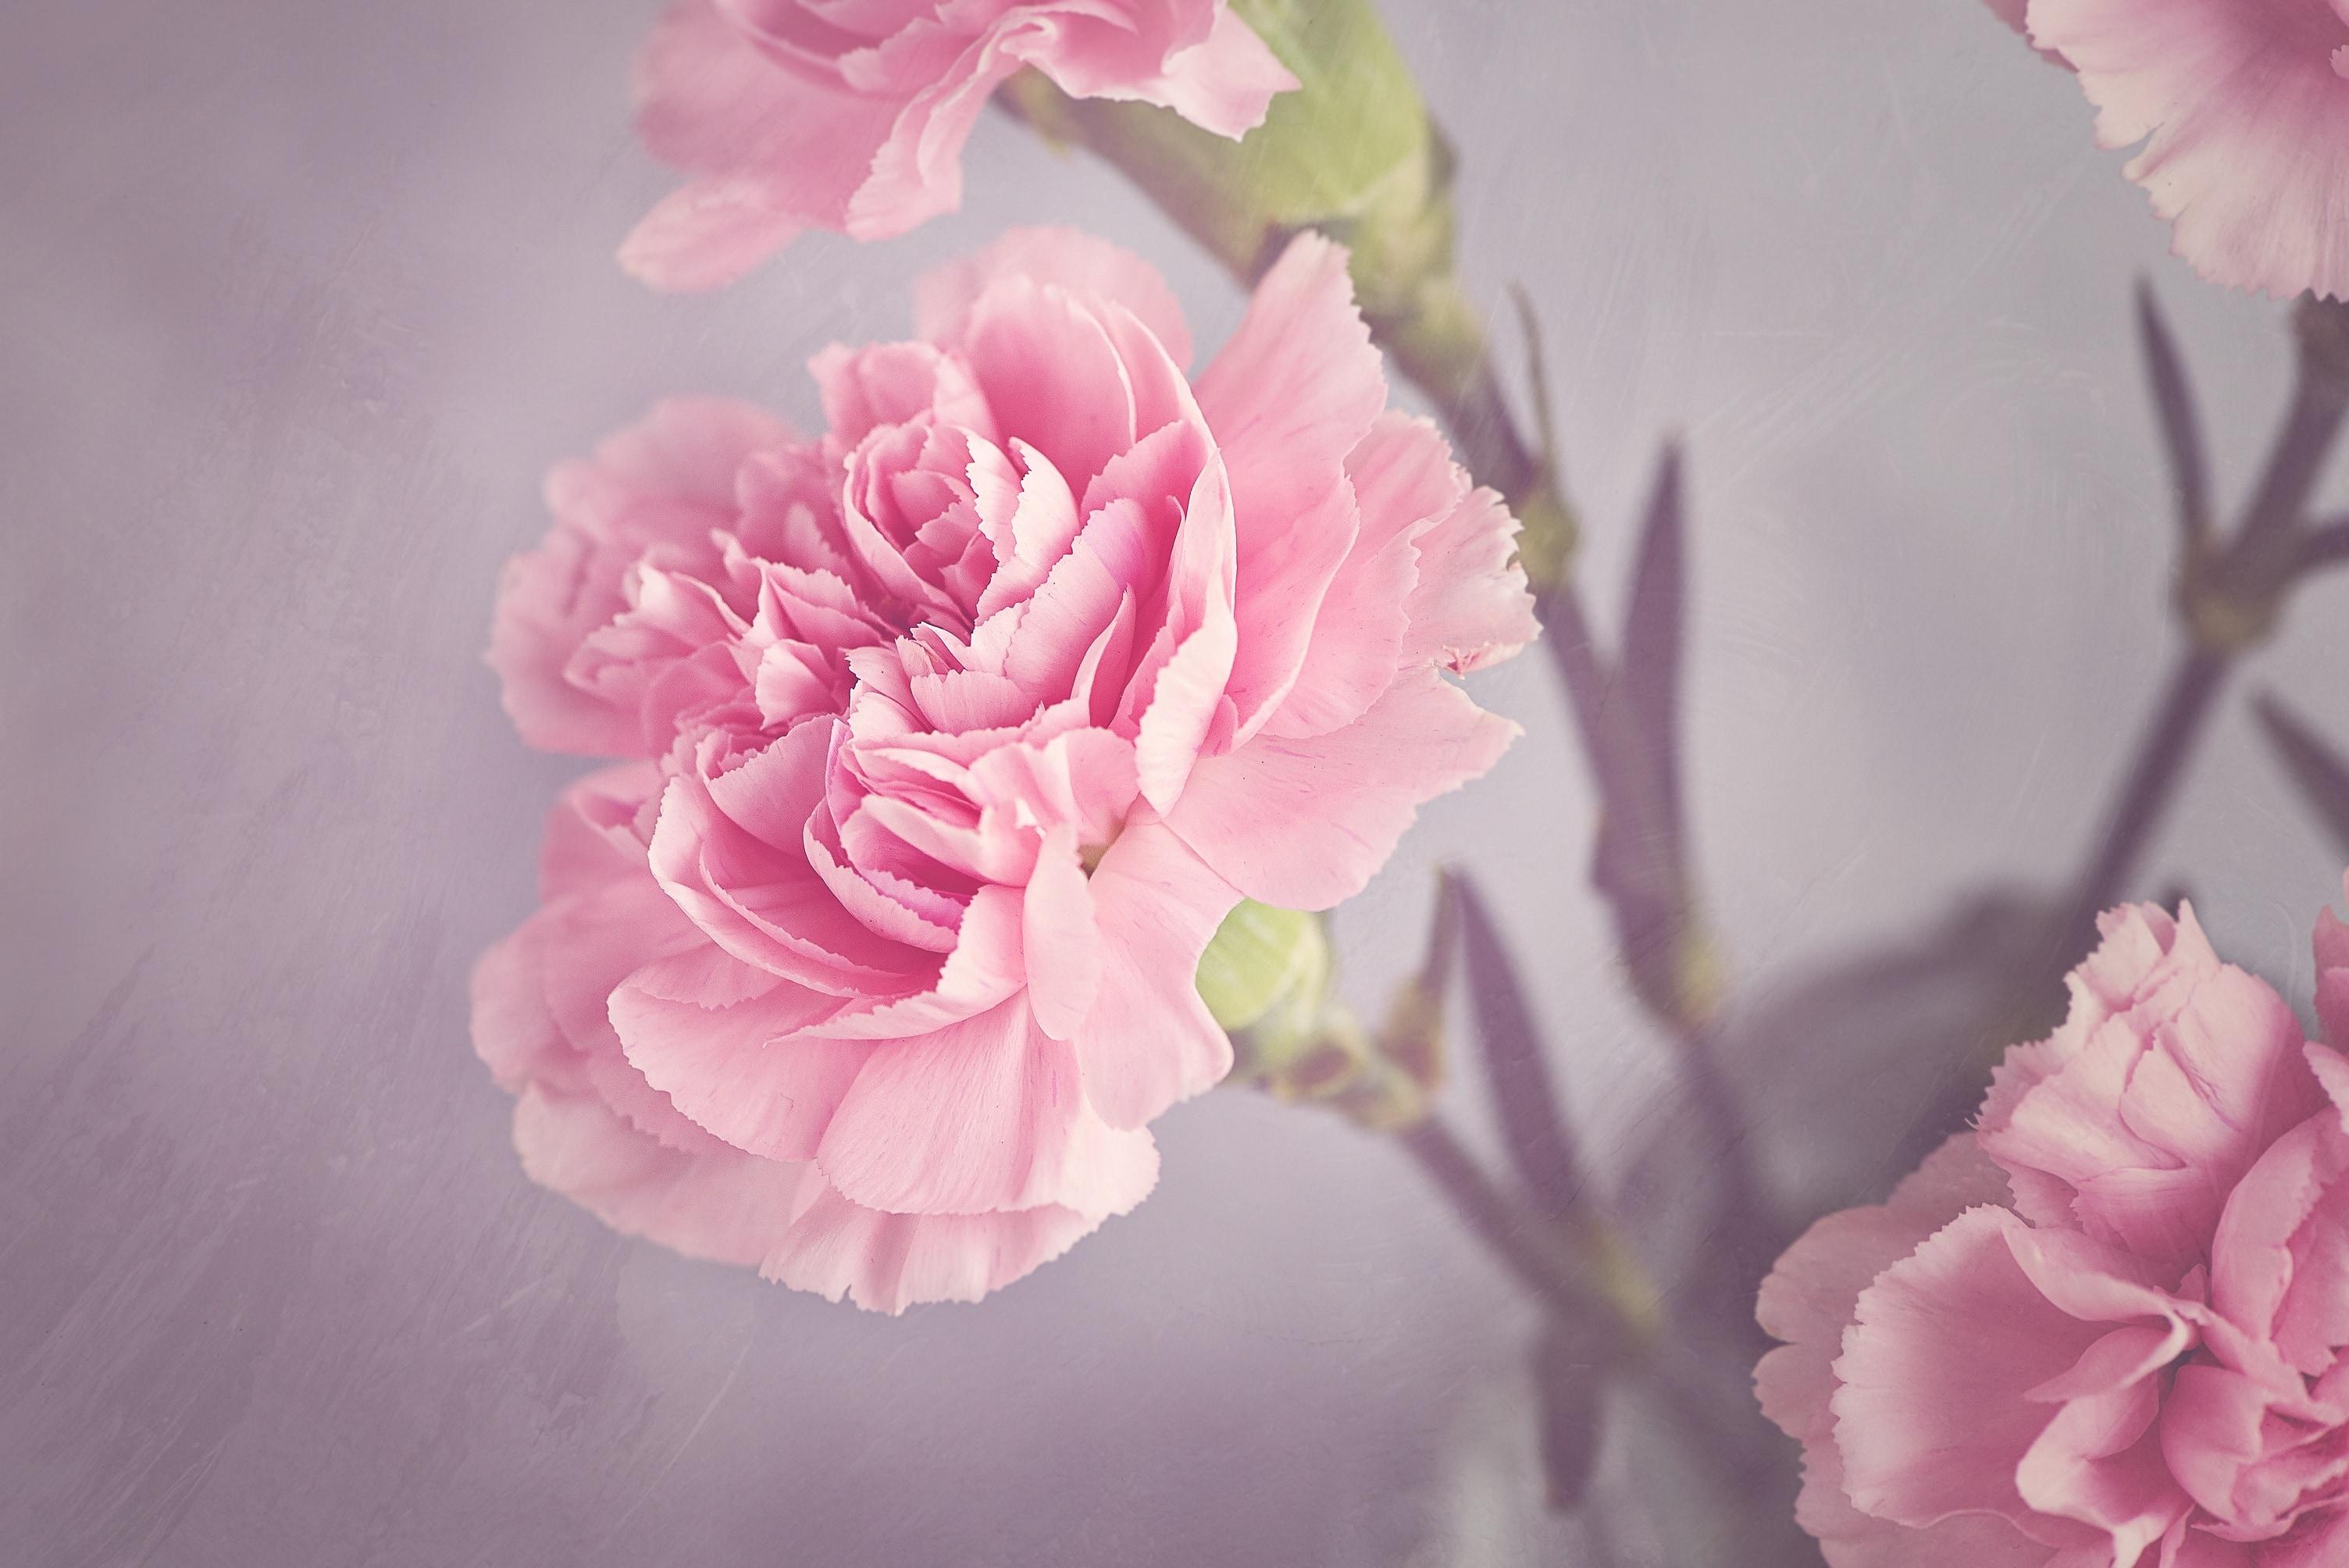 download pink carnation flower image Peakpx [3008x2008] for 3008x2008